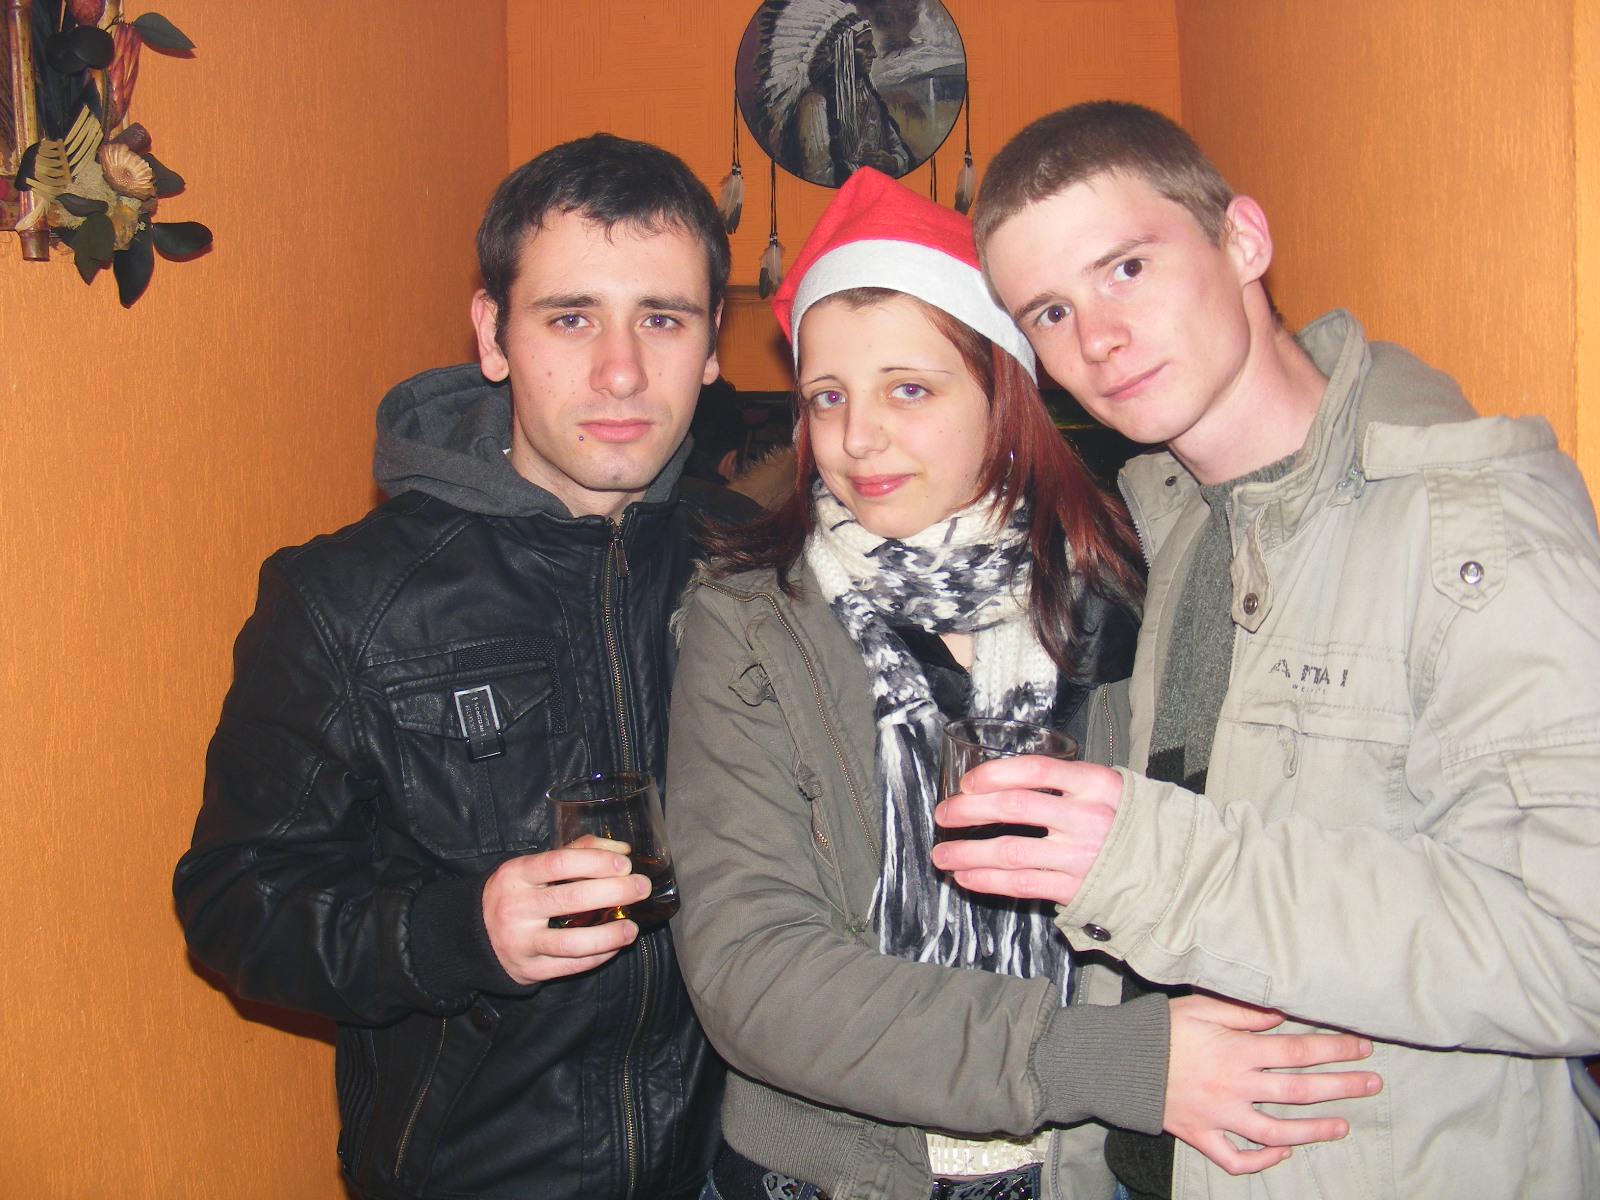 Discoteca en Hungría. Fotos Mohikan Soroko Mikulas-2010-039